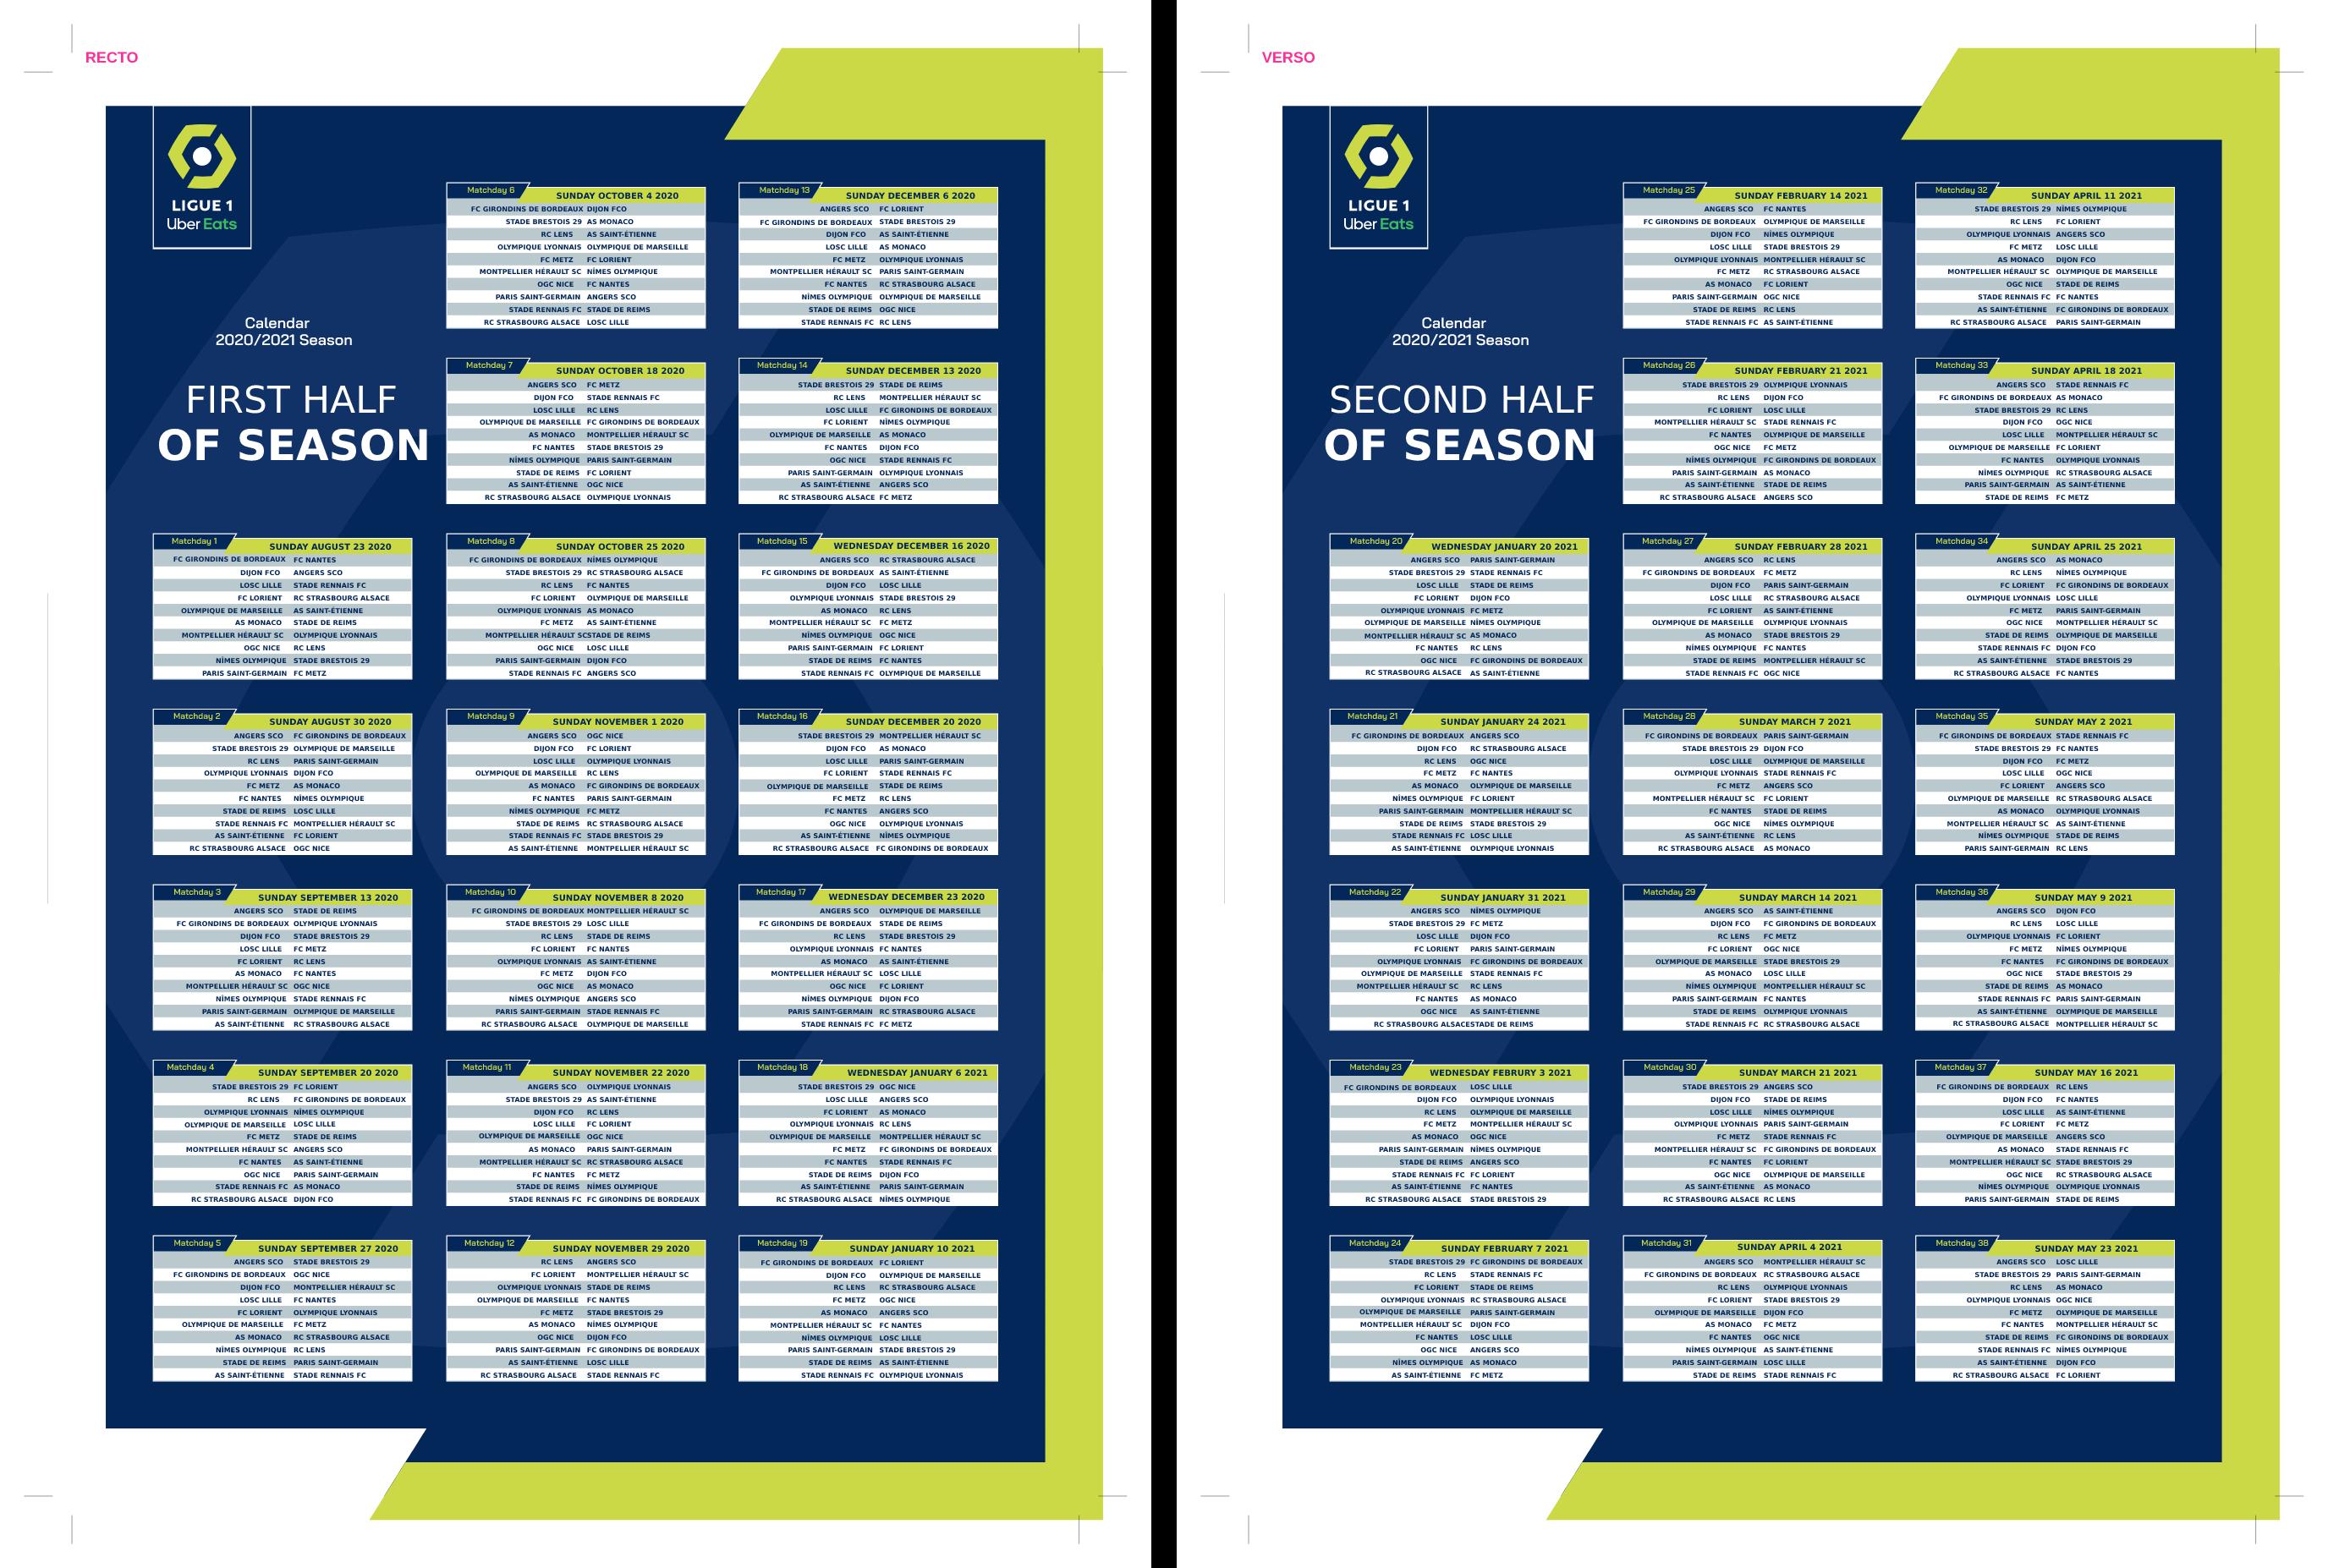 Calendrier Ligue 1 2021 Pdf L1 calendrier fdbleu A4 CC pdf 1 V2 — ImgBB